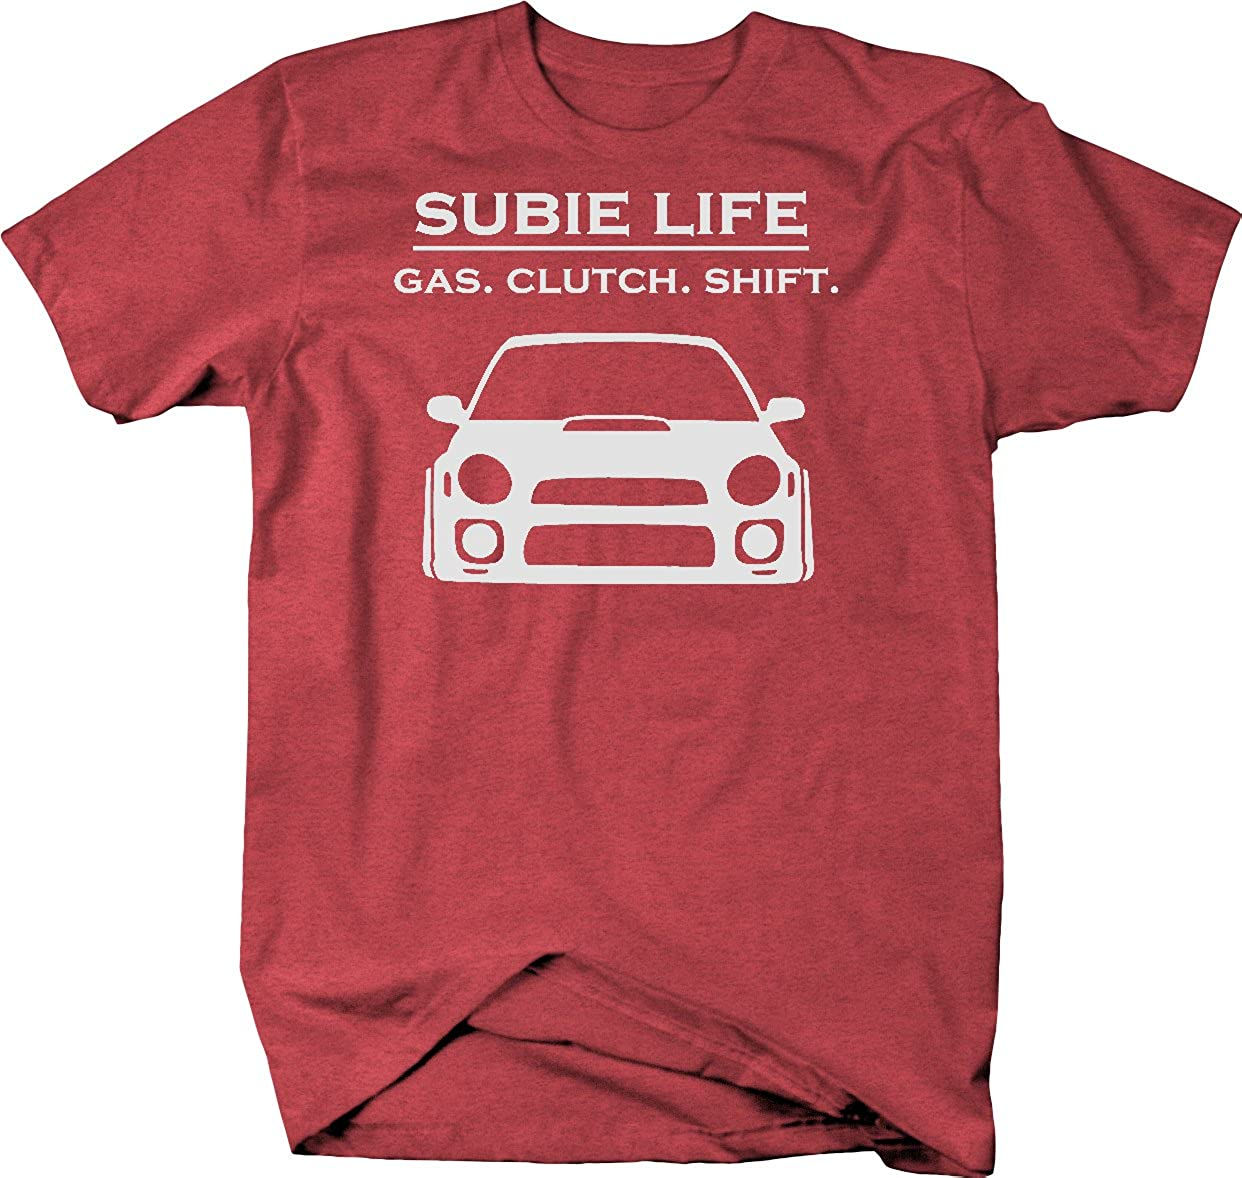 Rally Racing WRX STI Turbo JDM T Shirt Gas Clutch Shift CGM wear Subie Life